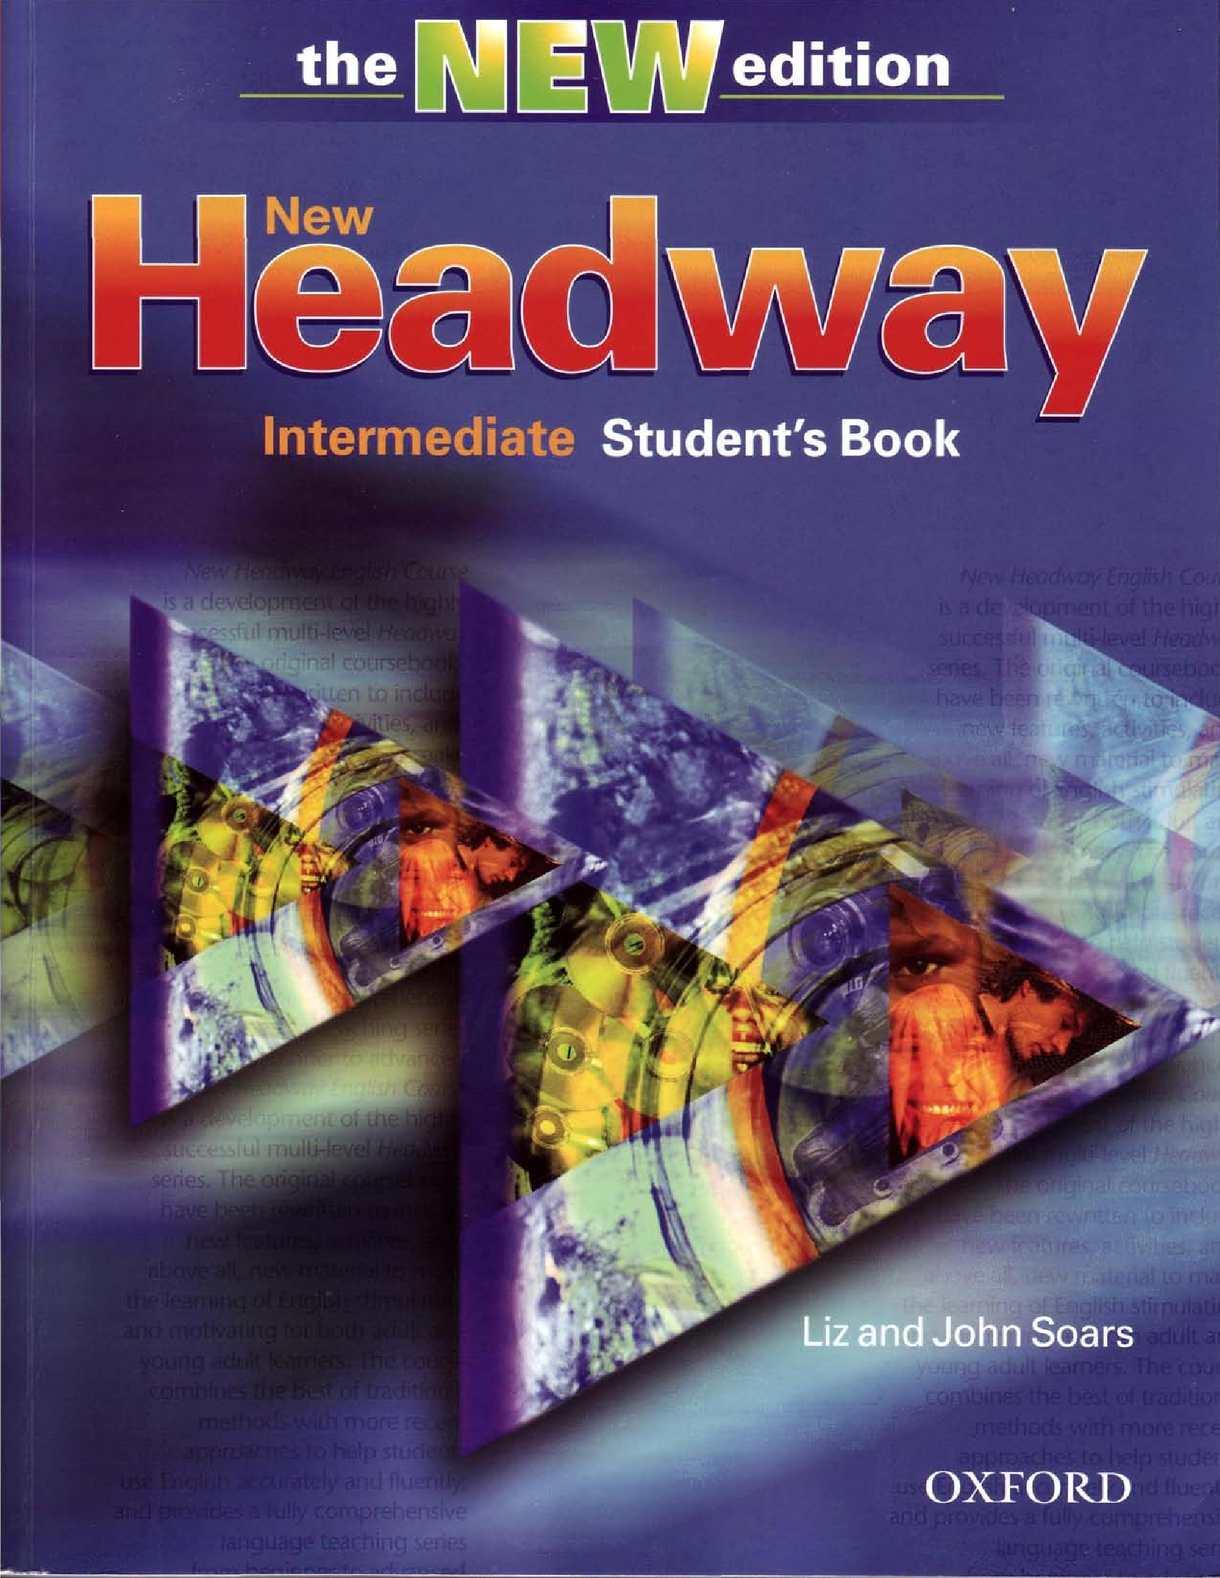 Headway entermidiate